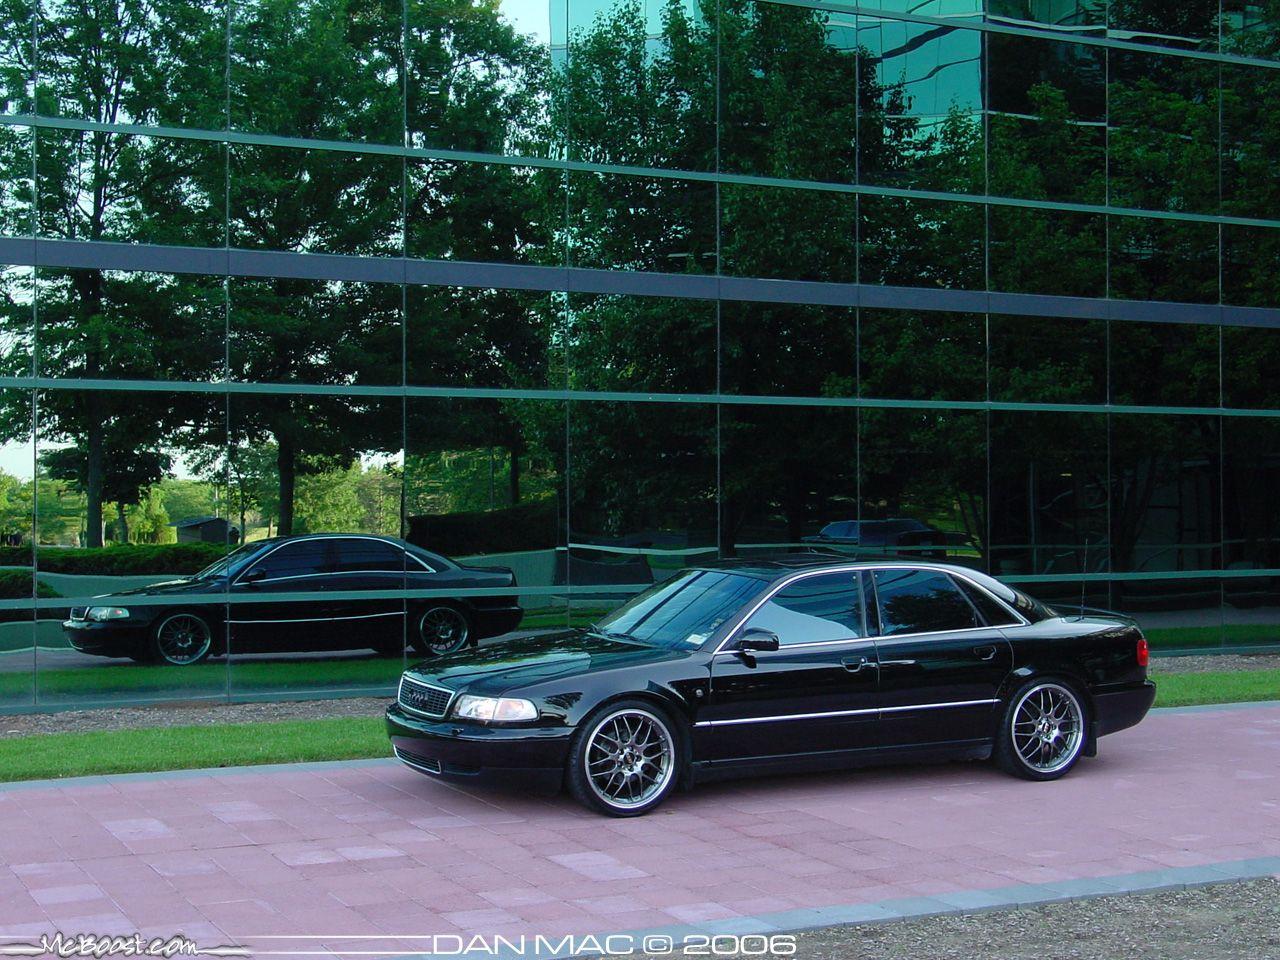 Audi A On Rims on 1997 audi wheels, 1997 audi s4, 1997 audi cabriolet, 1997 audi interior, 1997 audi quattro awd,